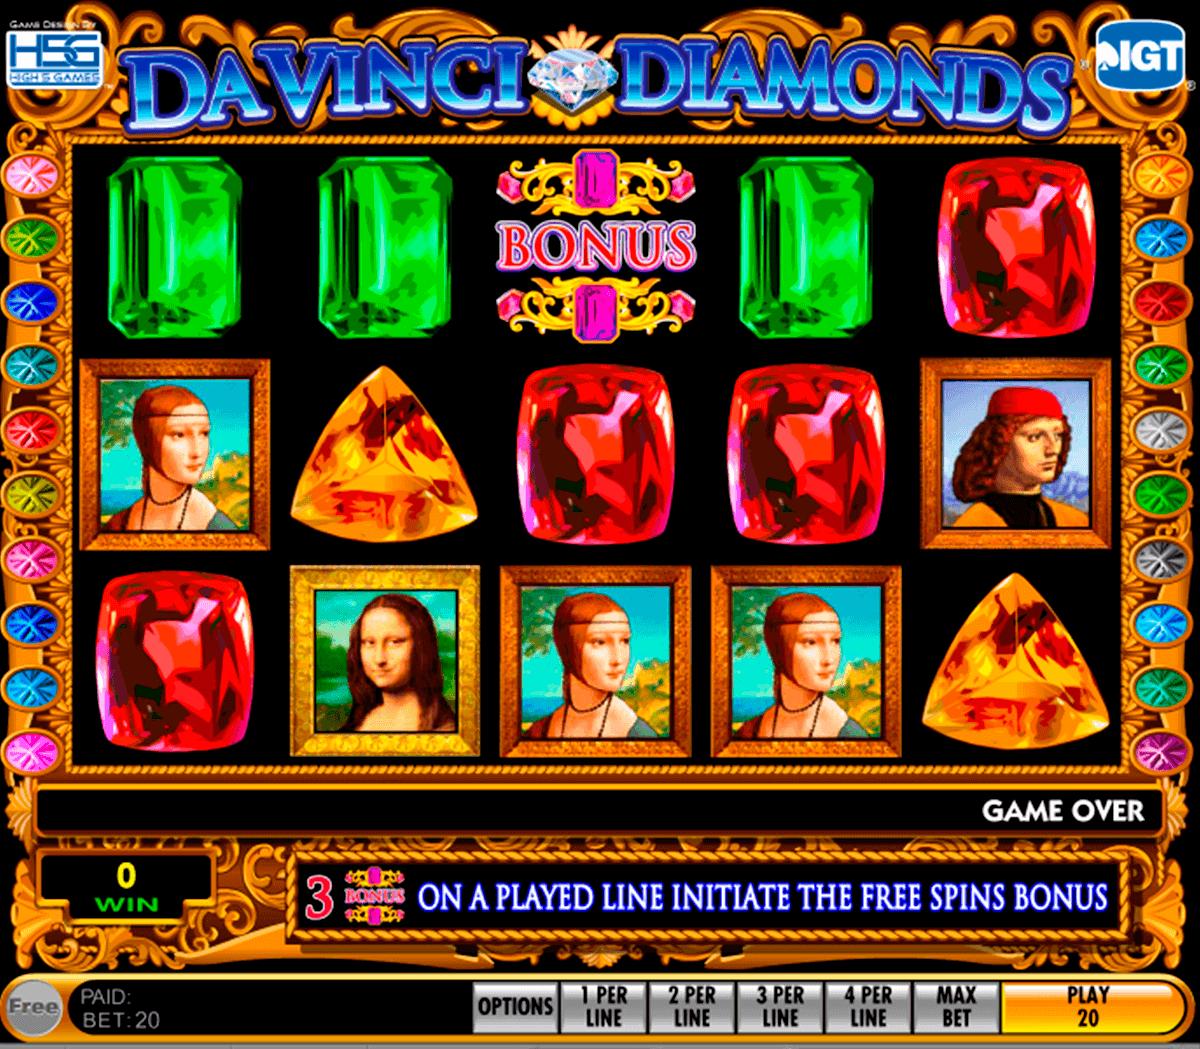 da vinci diamonds igt spielautomaten